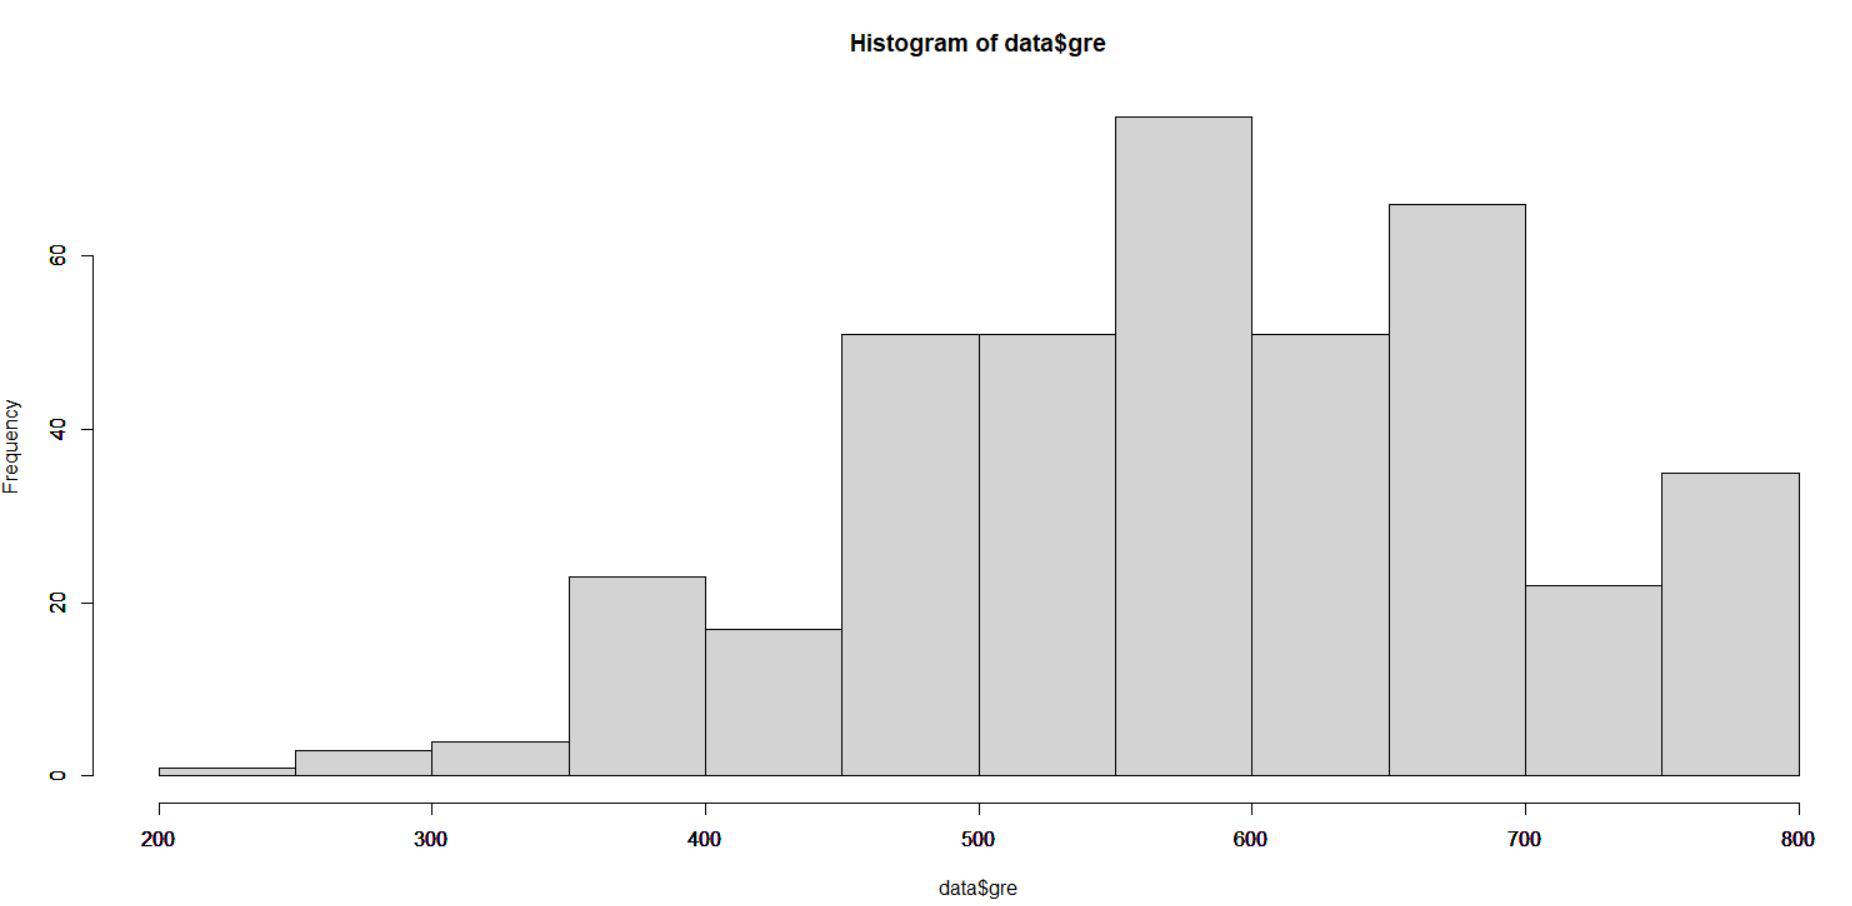 Unscaled Data Representation